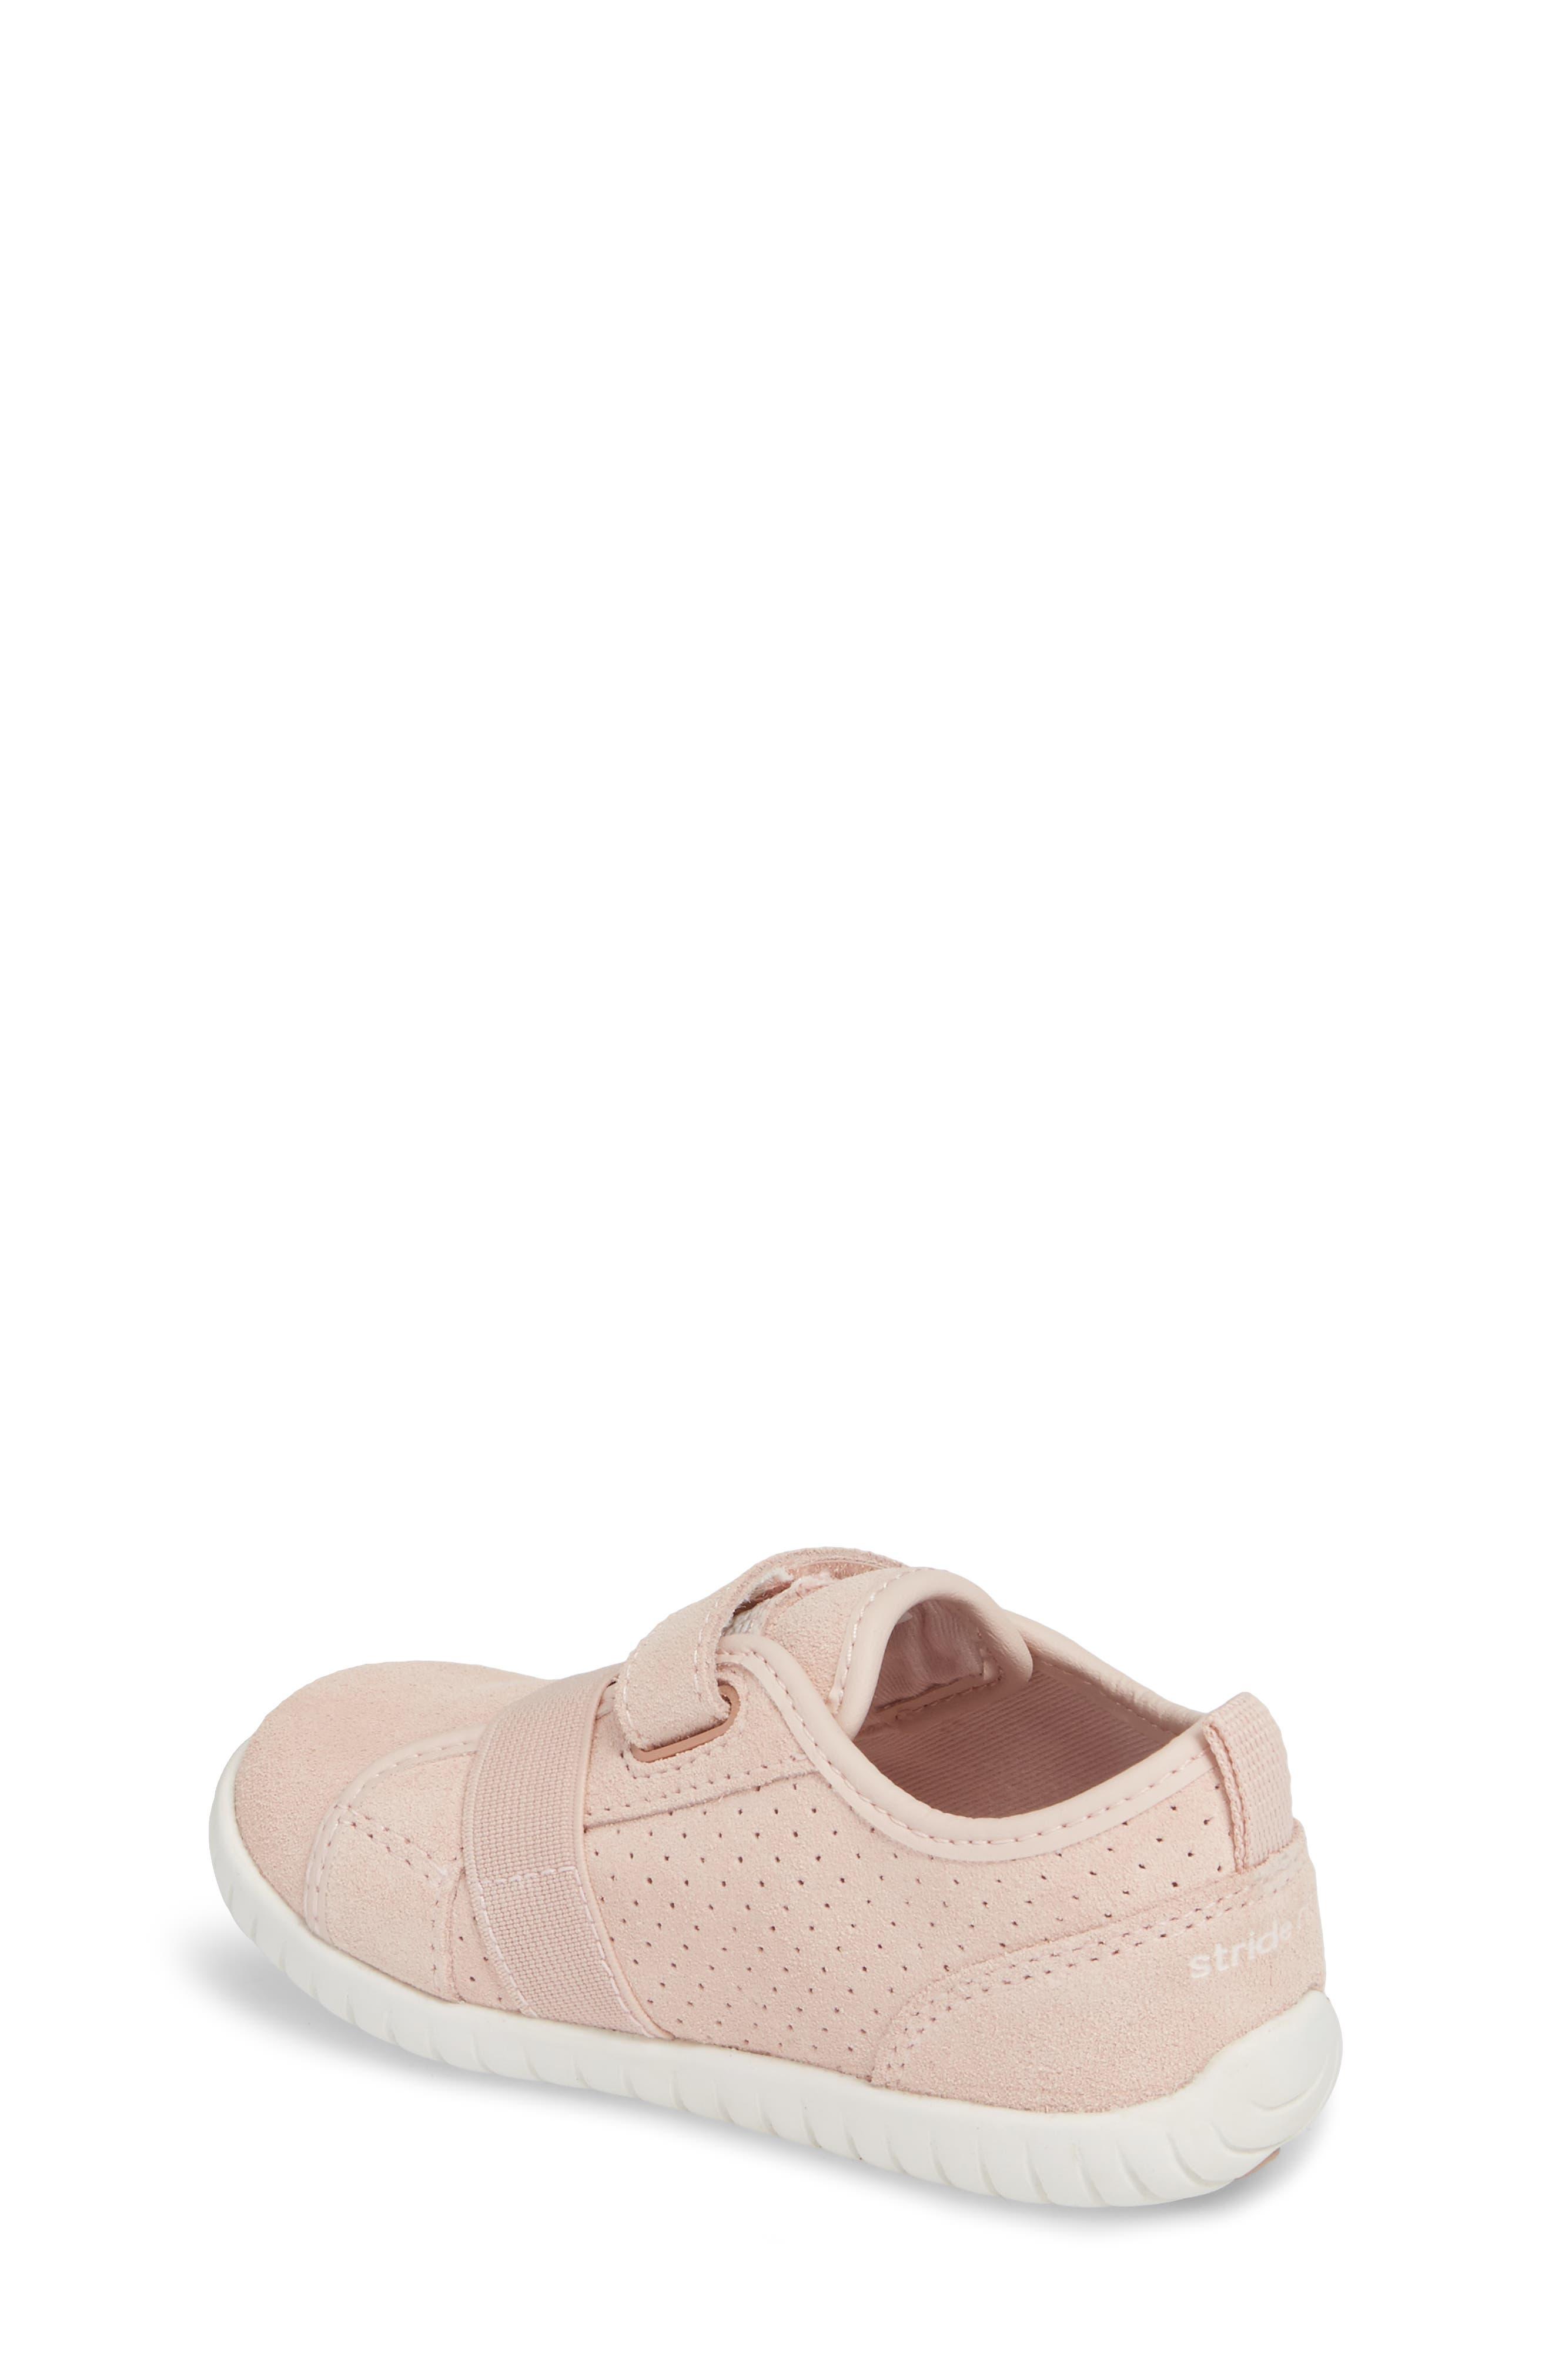 SRtech<sup>™</sup> Riley Sneaker,                             Alternate thumbnail 2, color,                             Blush Leather